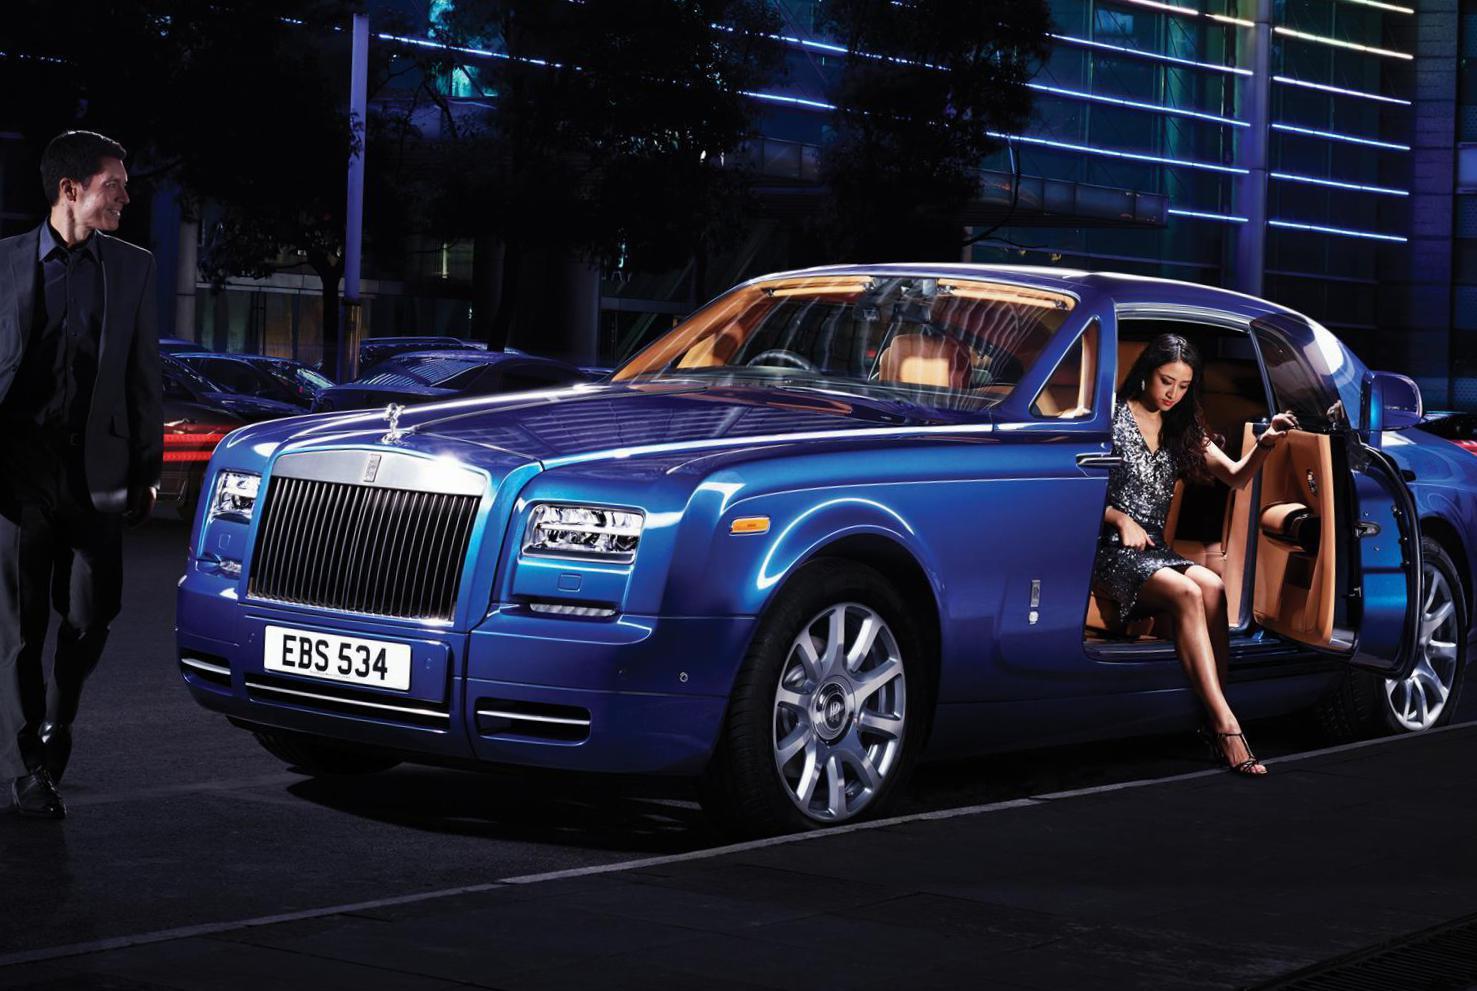 Phantom Rolls Royce Lease Hatchback